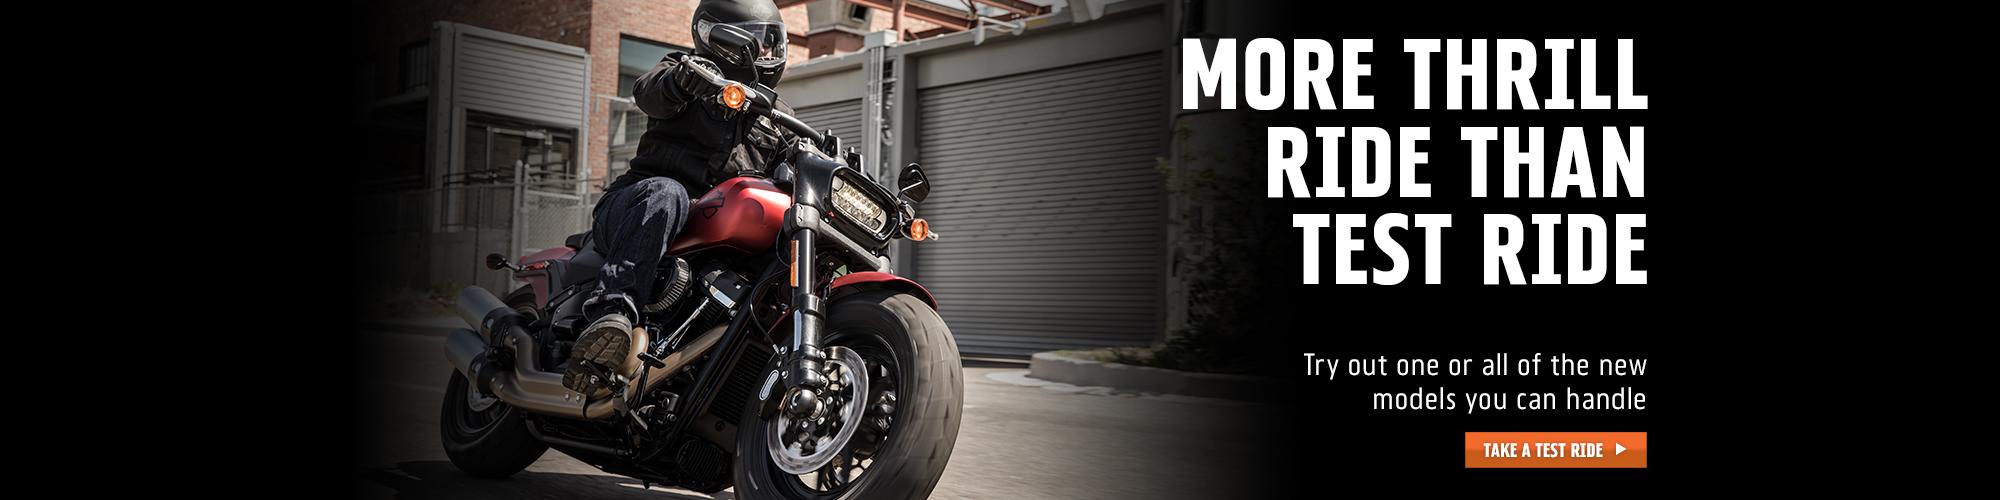 Harley-Davidson More Thrill Than Test Ride at La Crosse Area Harley-Davidson